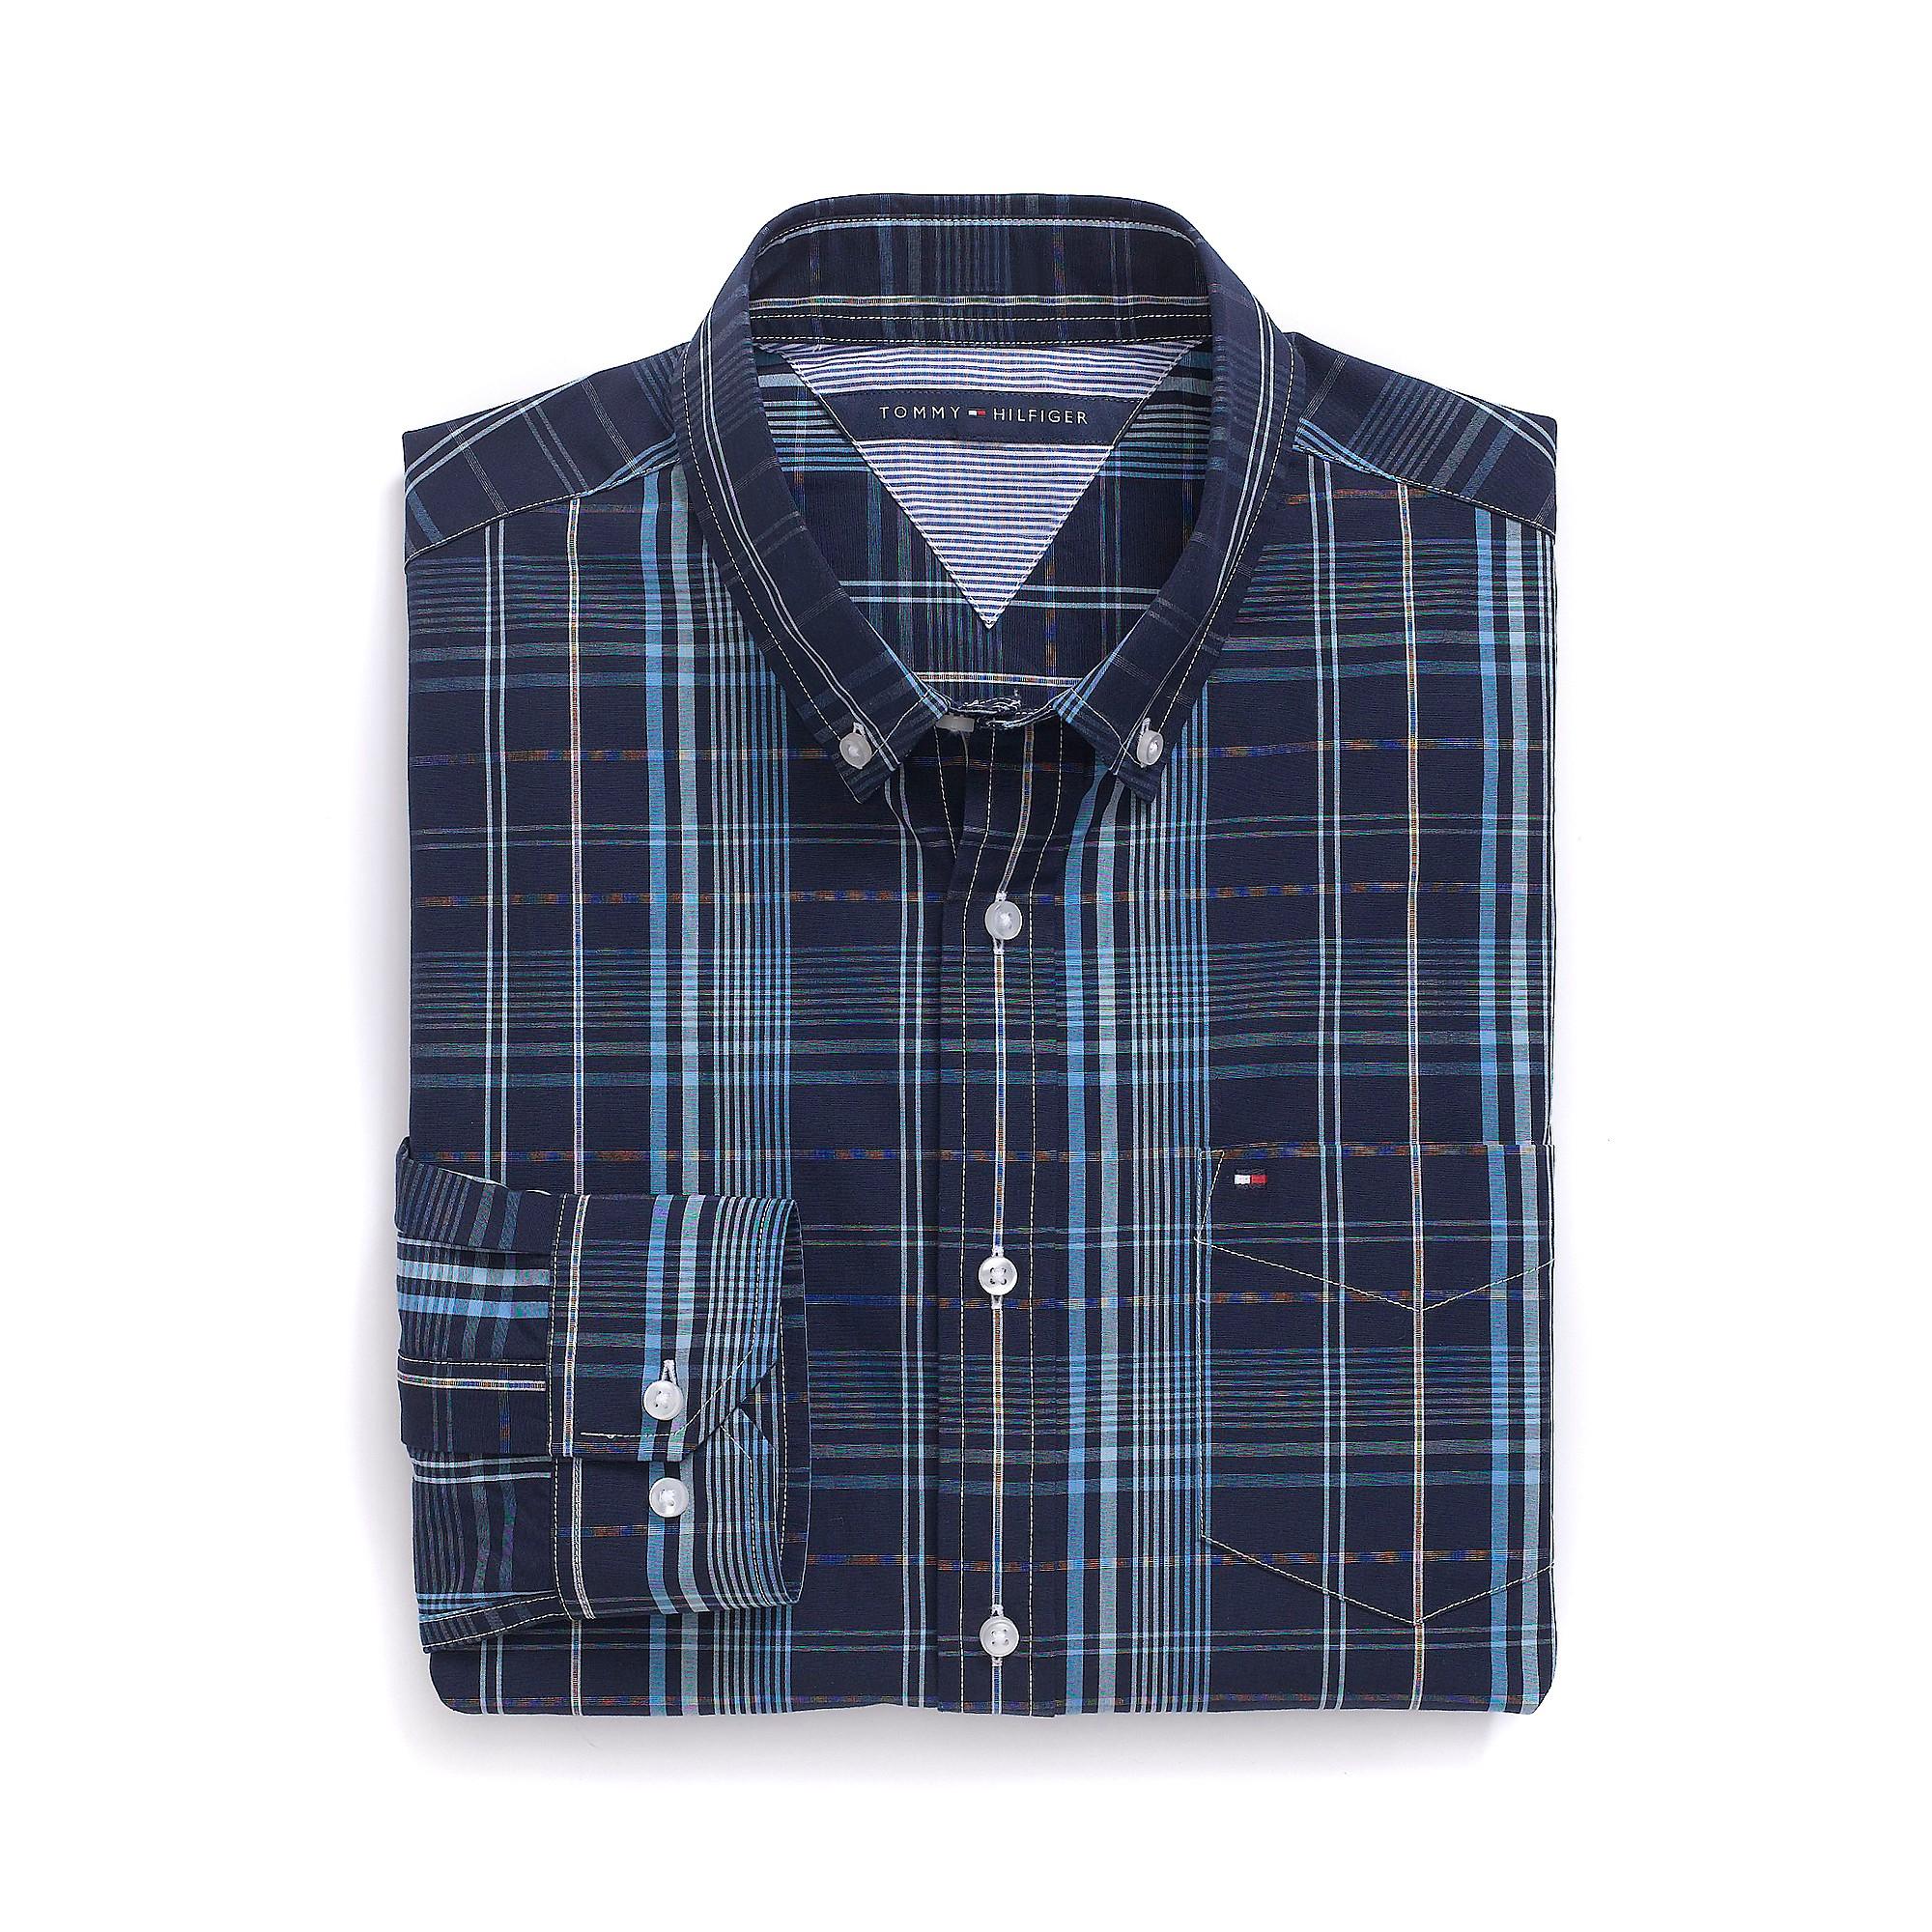 Tommy Hilfiger Custom Fit Plaid Shirt In Blue For Men